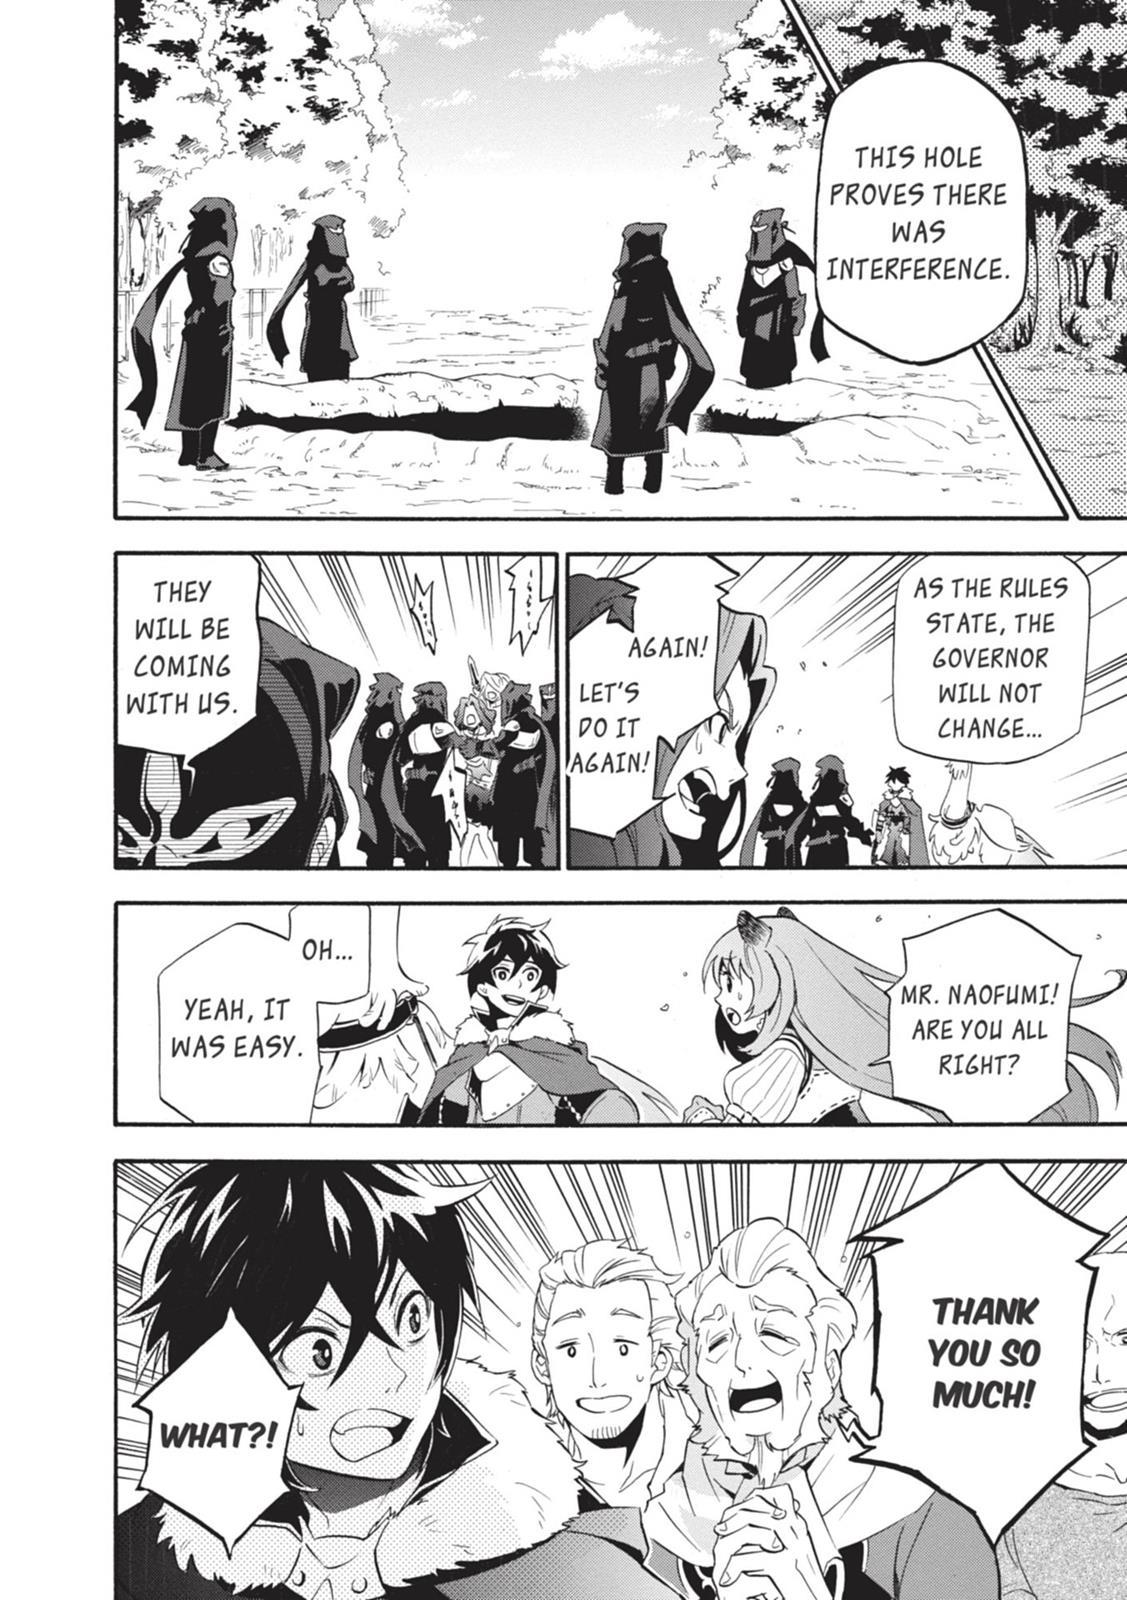 Tate no Yuusha no Nariagari, Chapter 10 image 031